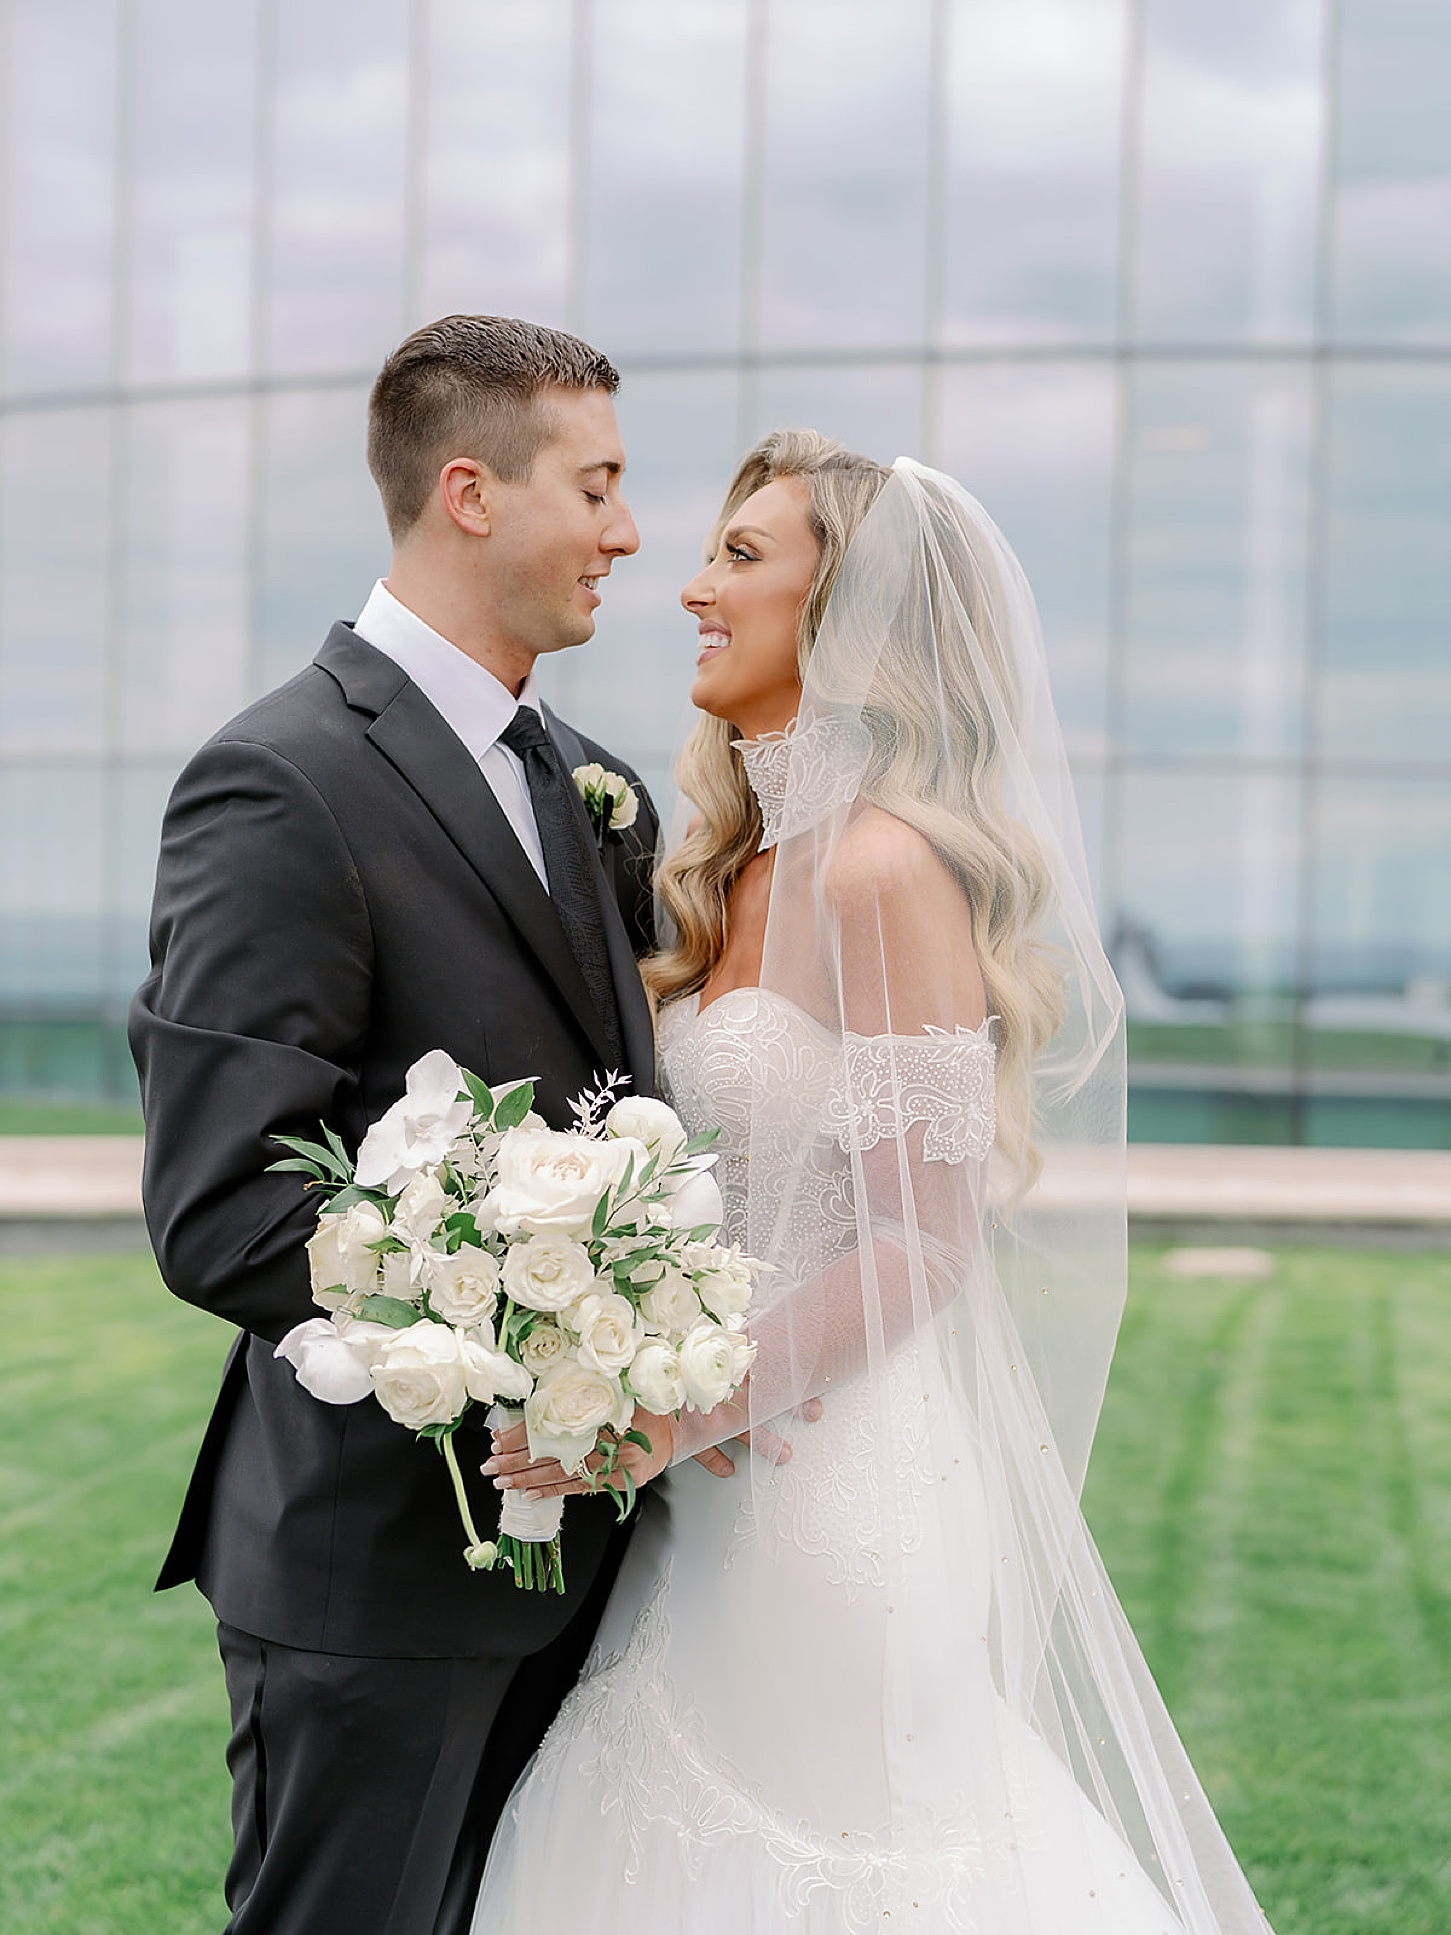 Atlantic City Wedding Photography Studio by Magdalena Studios Lexy Cha 0070